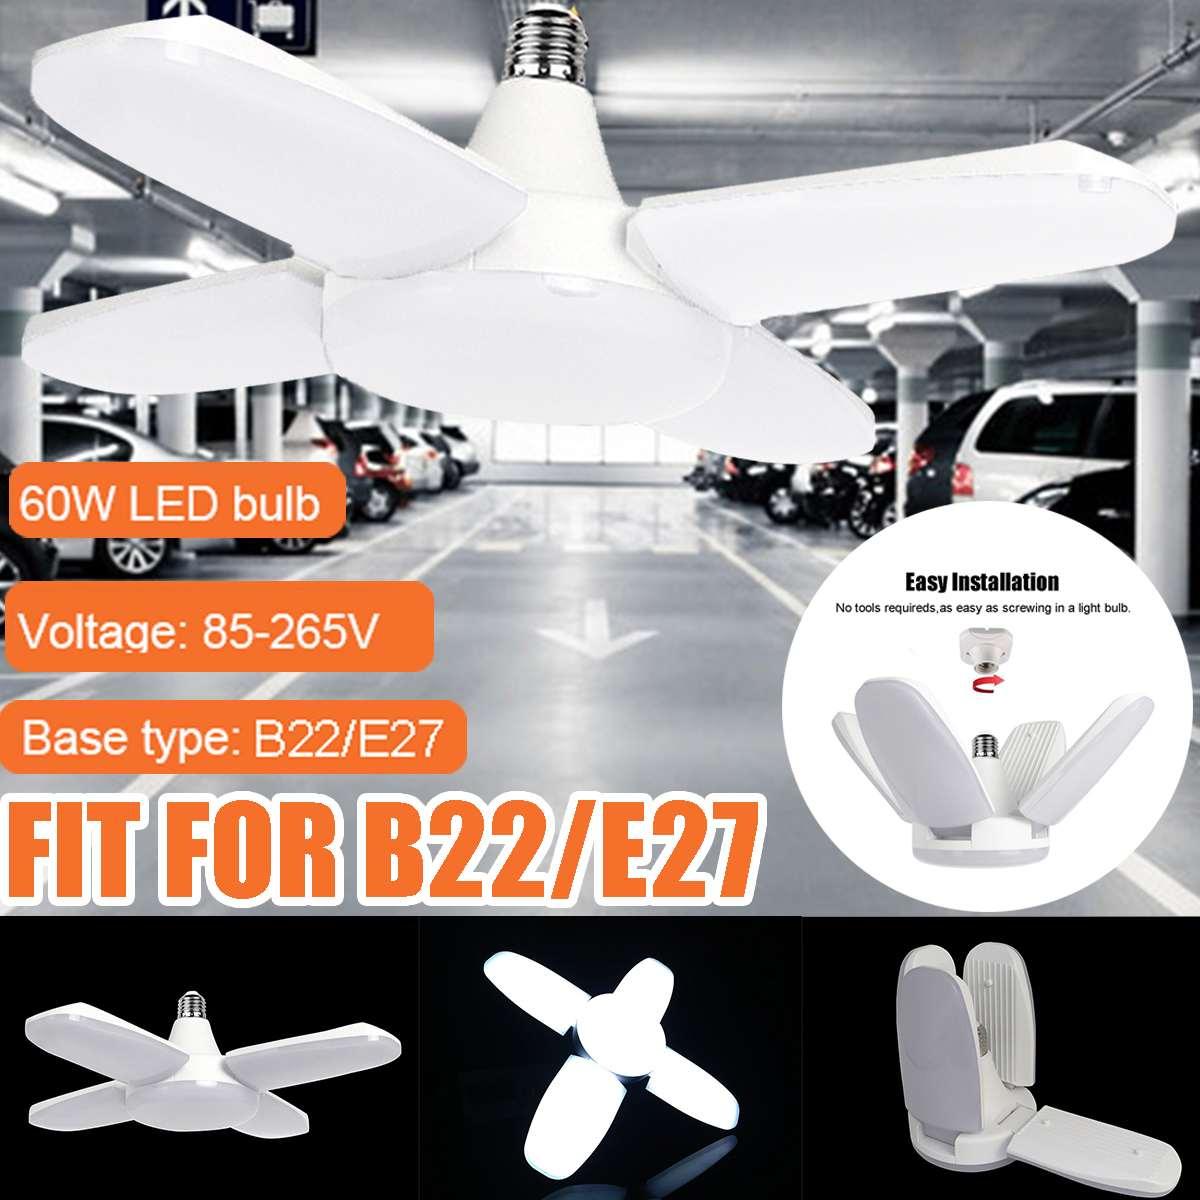 60W E27/B22 Deformable Garage Light Bright Industrial Lighting Led 6000LM 100-265V 2835 High Bay Industrial Lamp For Workshop